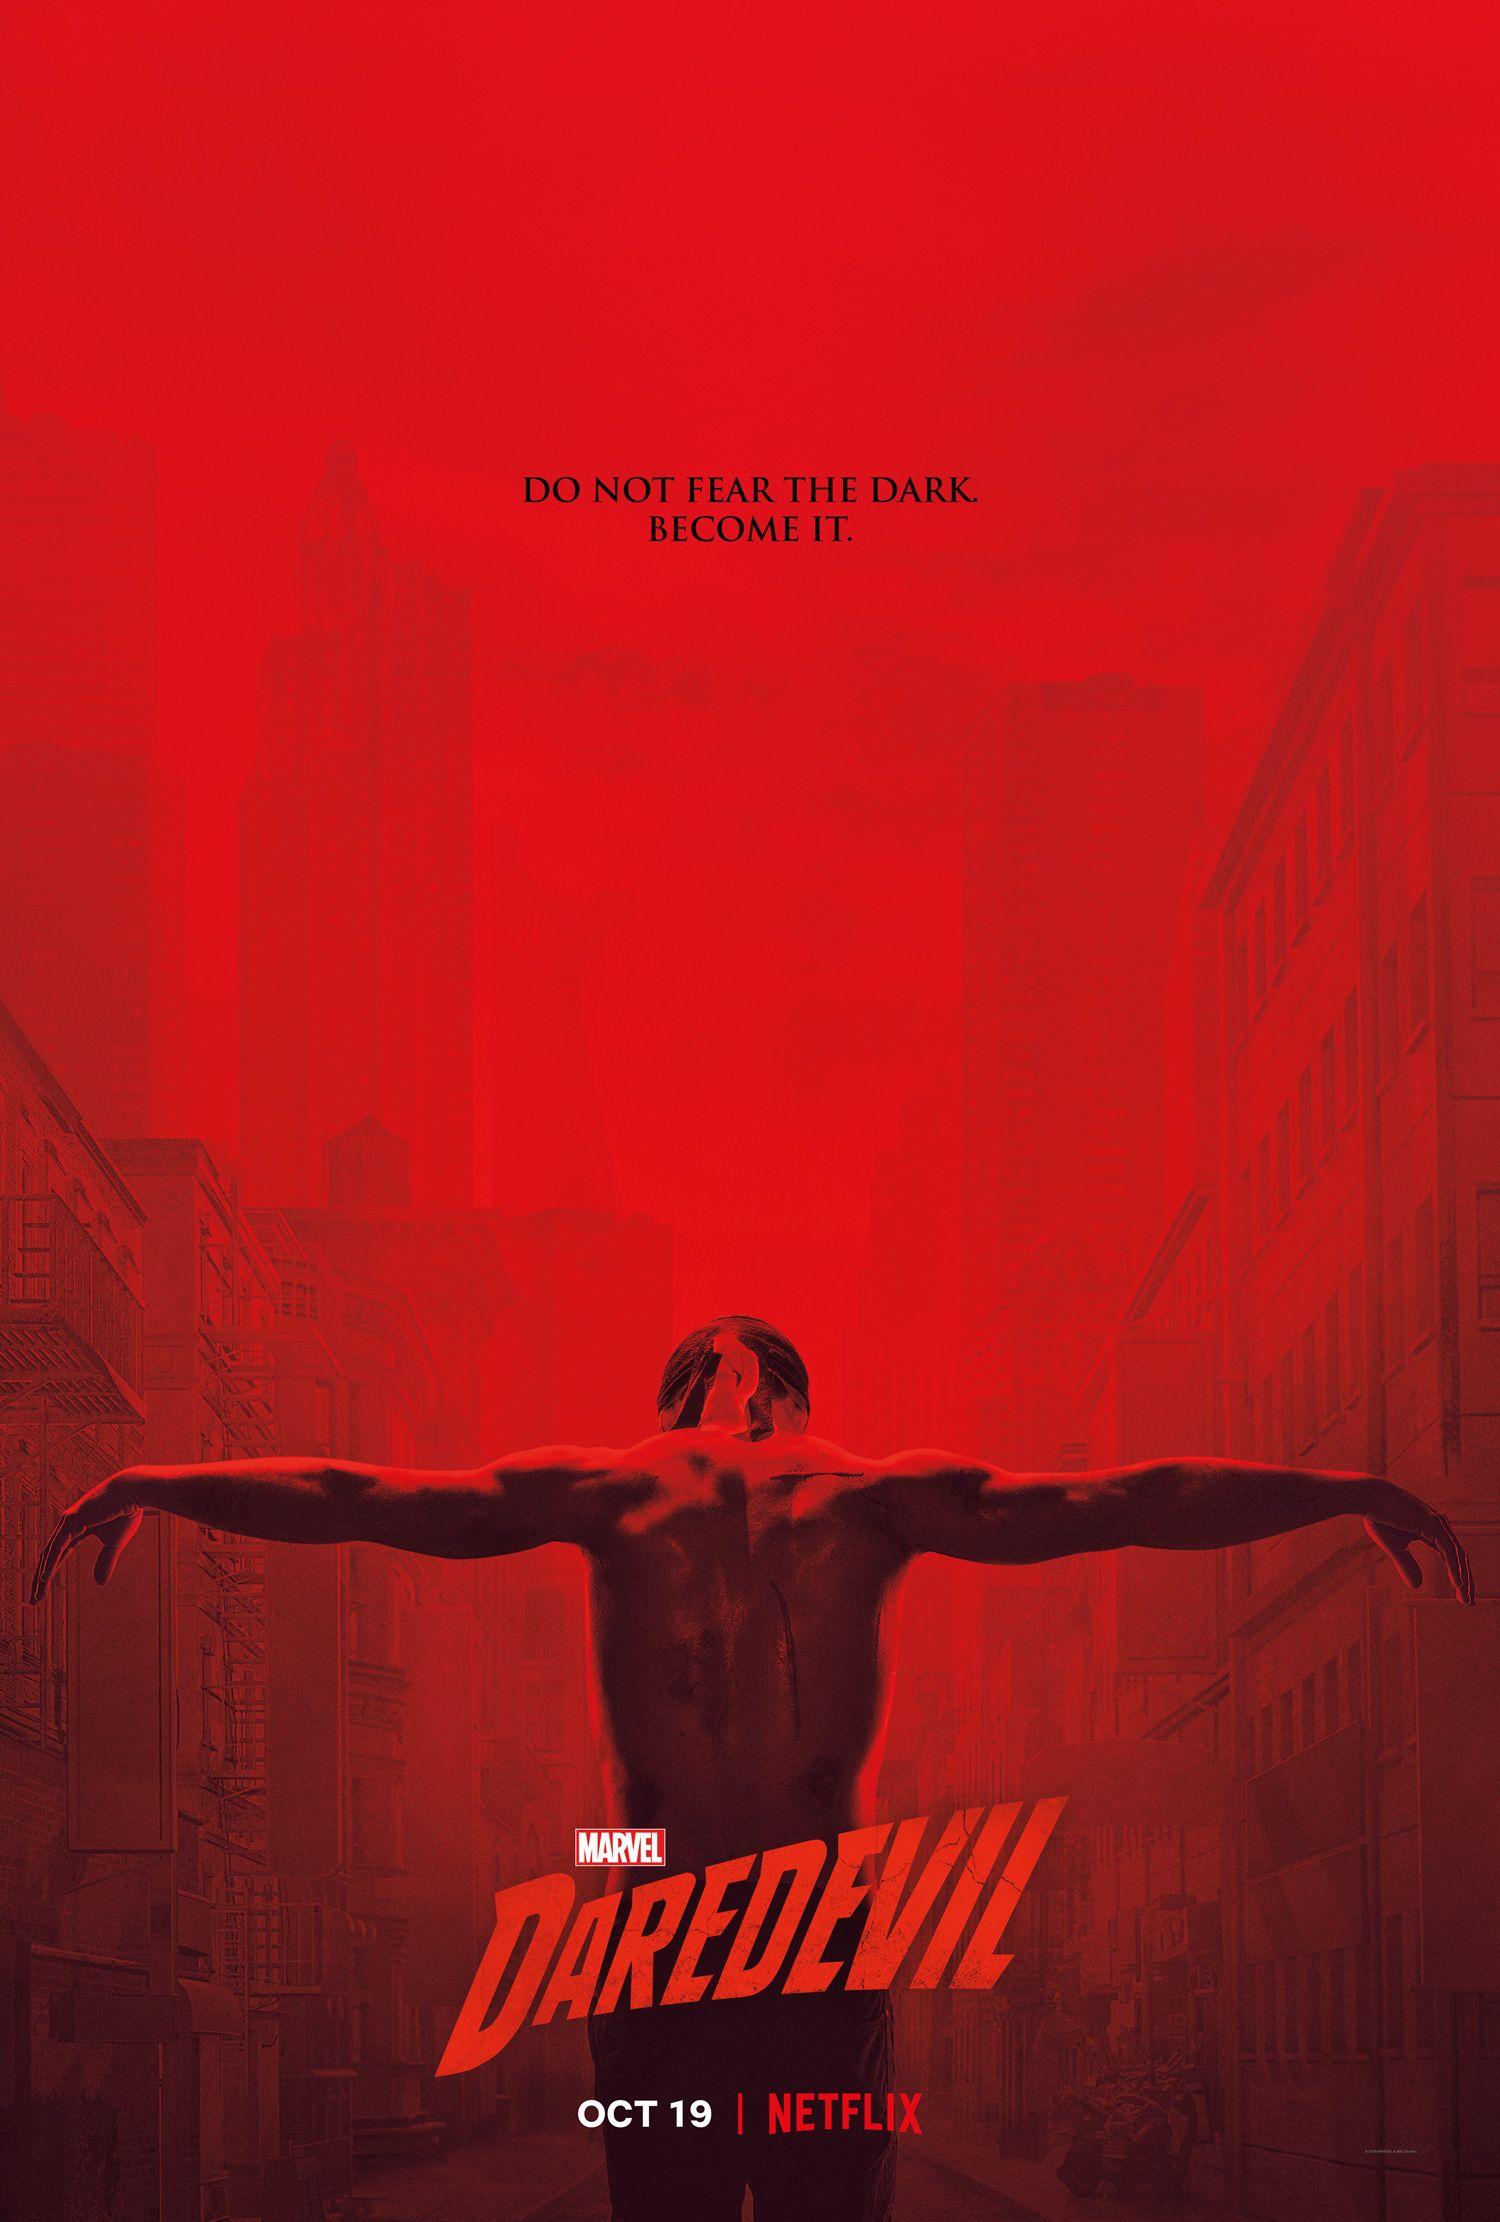 fffac4d4efc Daredevil Season 3 Release Date Revealed in New Trailer